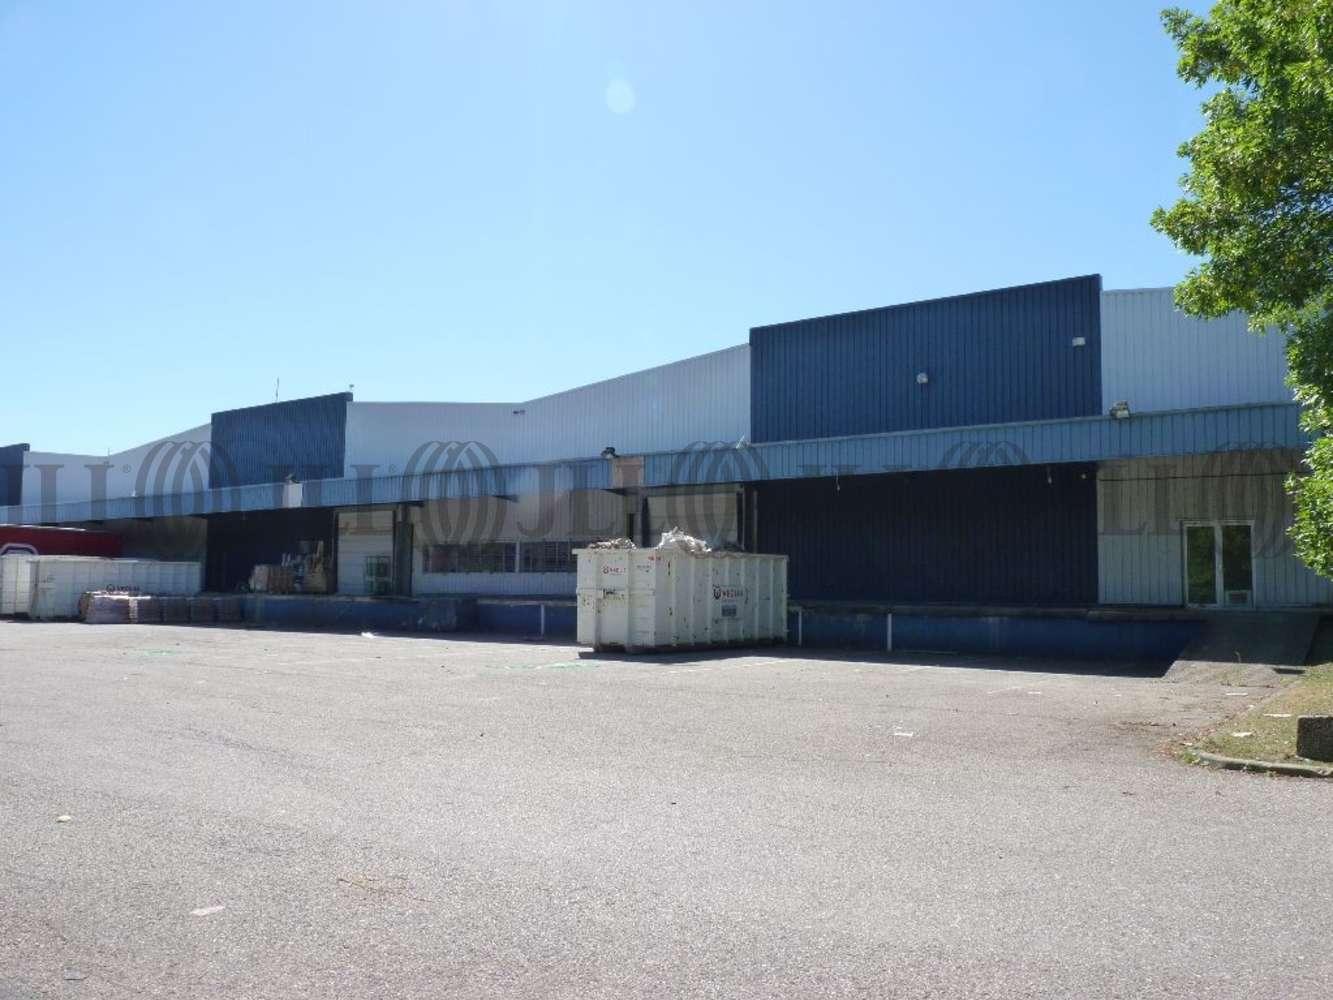 Activités/entrepôt Dardilly, 69570 - LOCATION ENTREPOT DARDILLY - LYON NORD